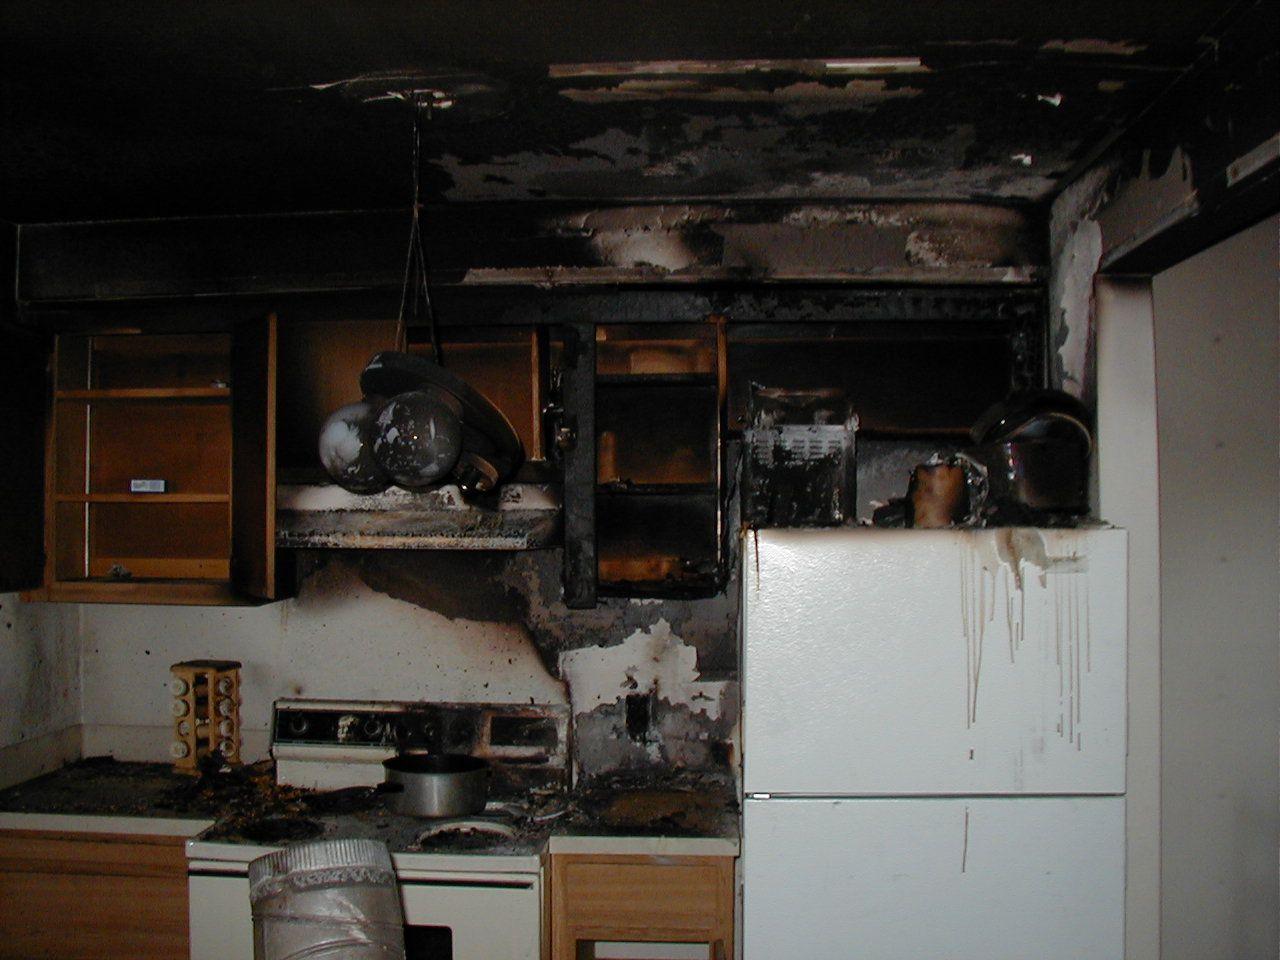 Fire damage services fire damage damage restoration